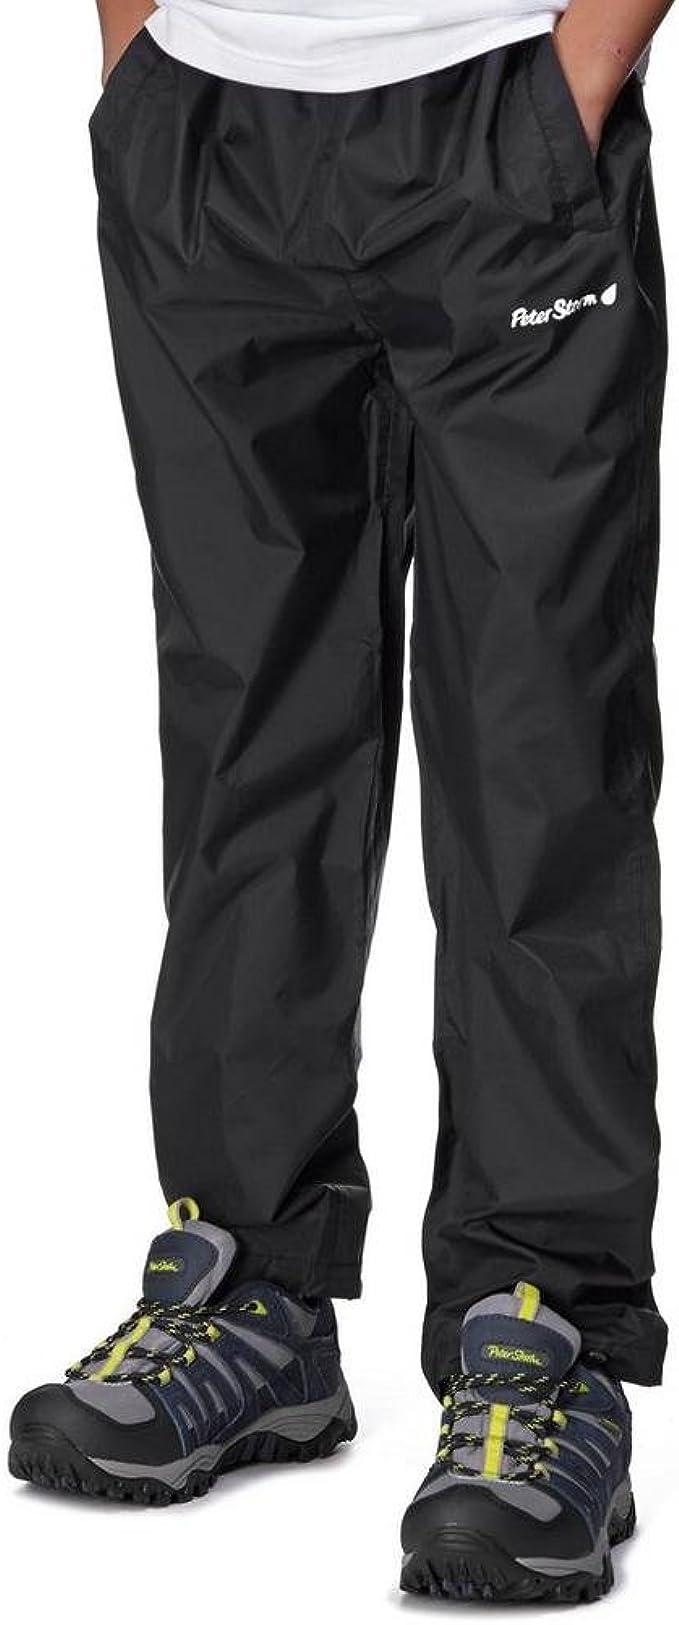 Peter Storm Kids Unisex Waterproof Over Trousers